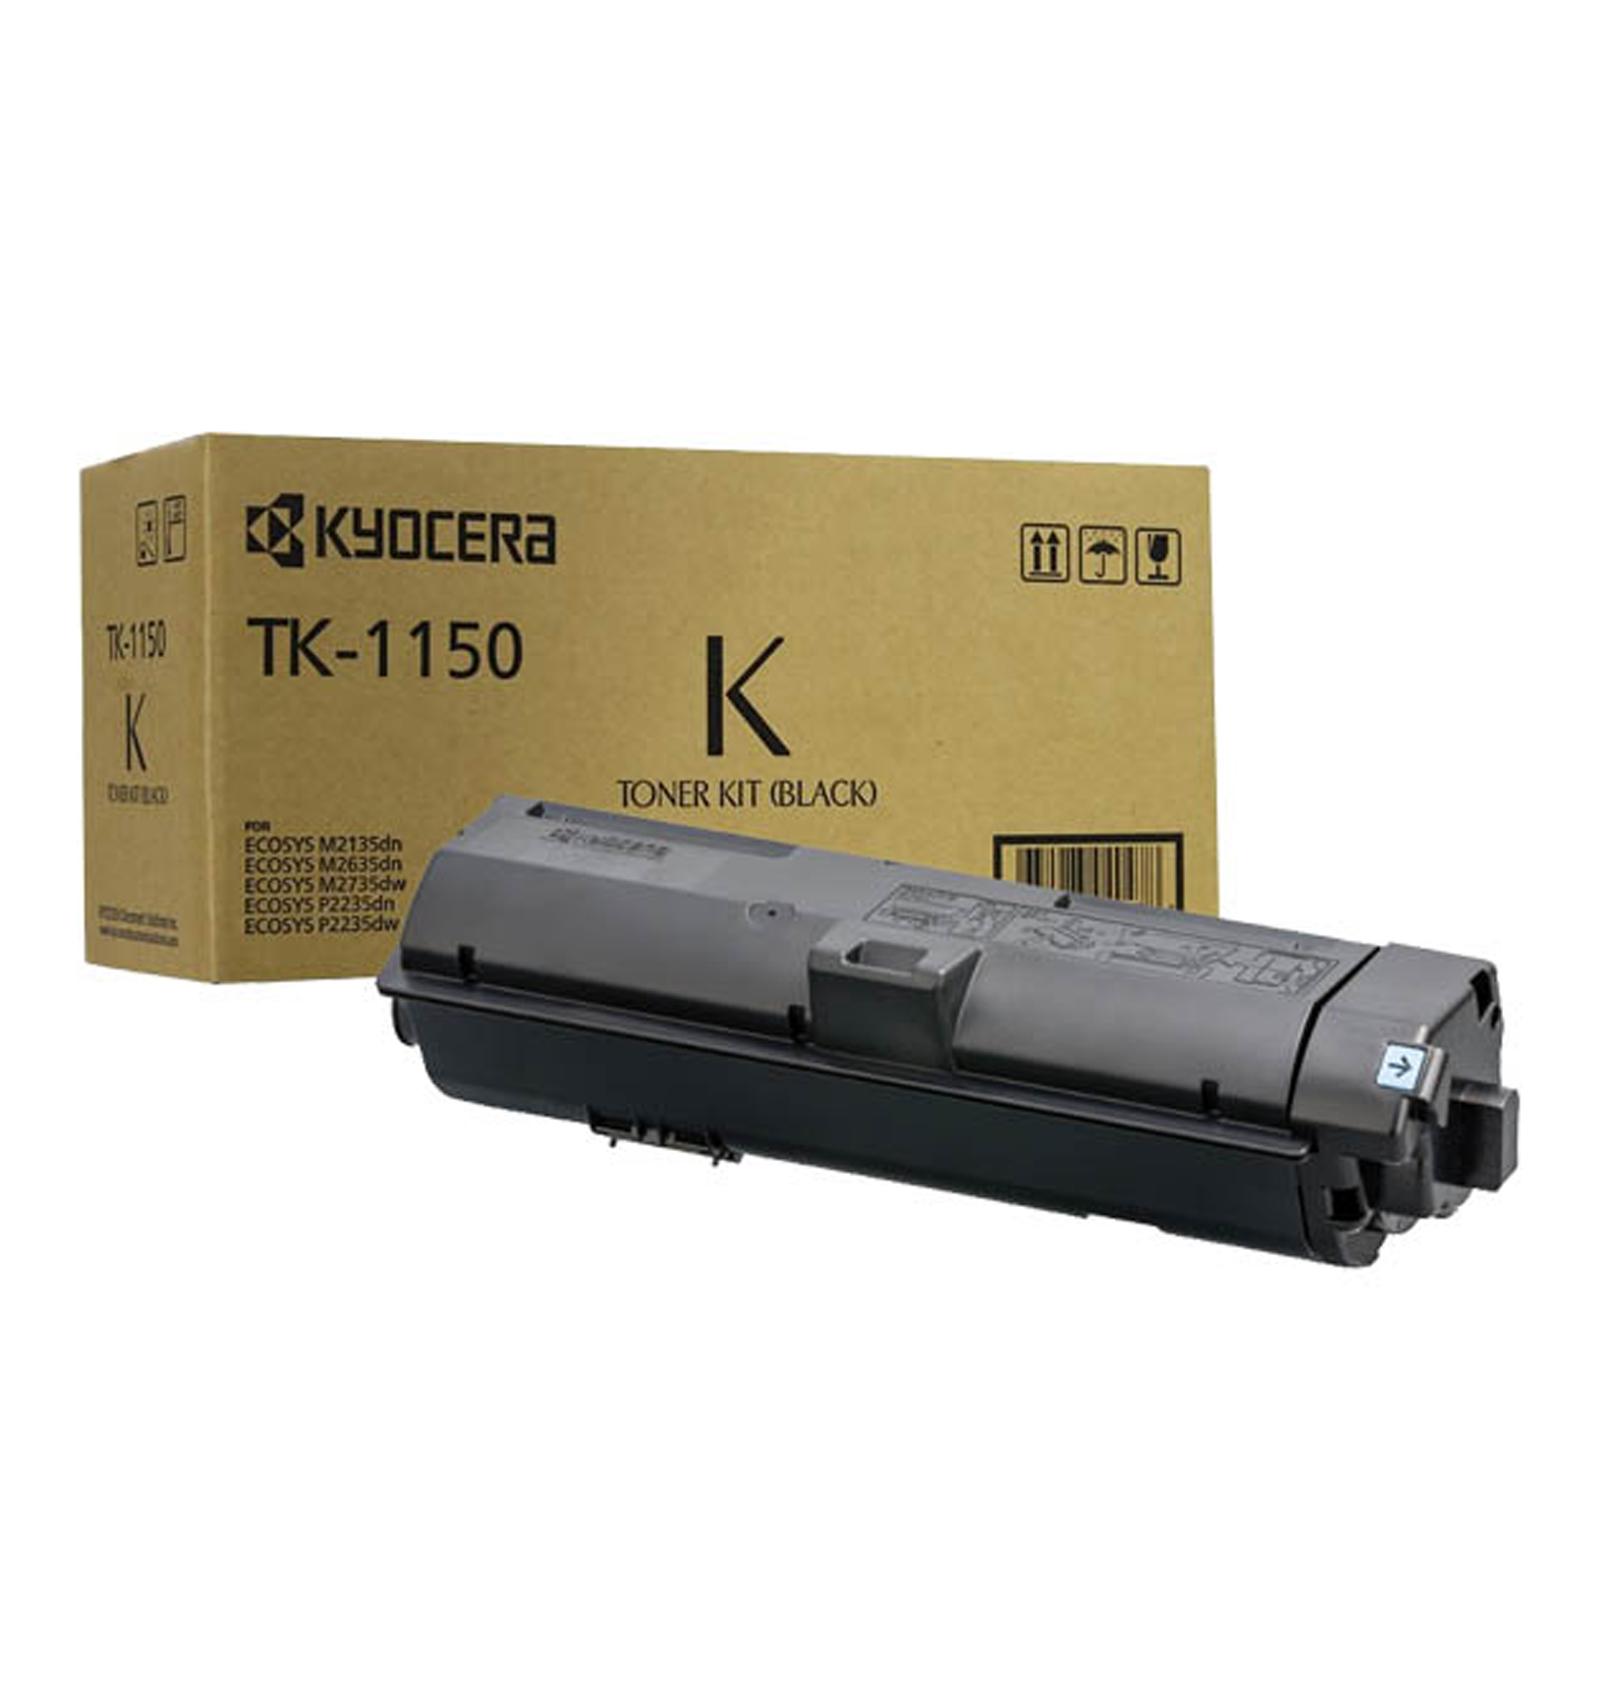 Kyocera TK-1150 для Kyocera ECOSYS M2135dn / M2635dn / M2735dw, P2235dn / P2235dw